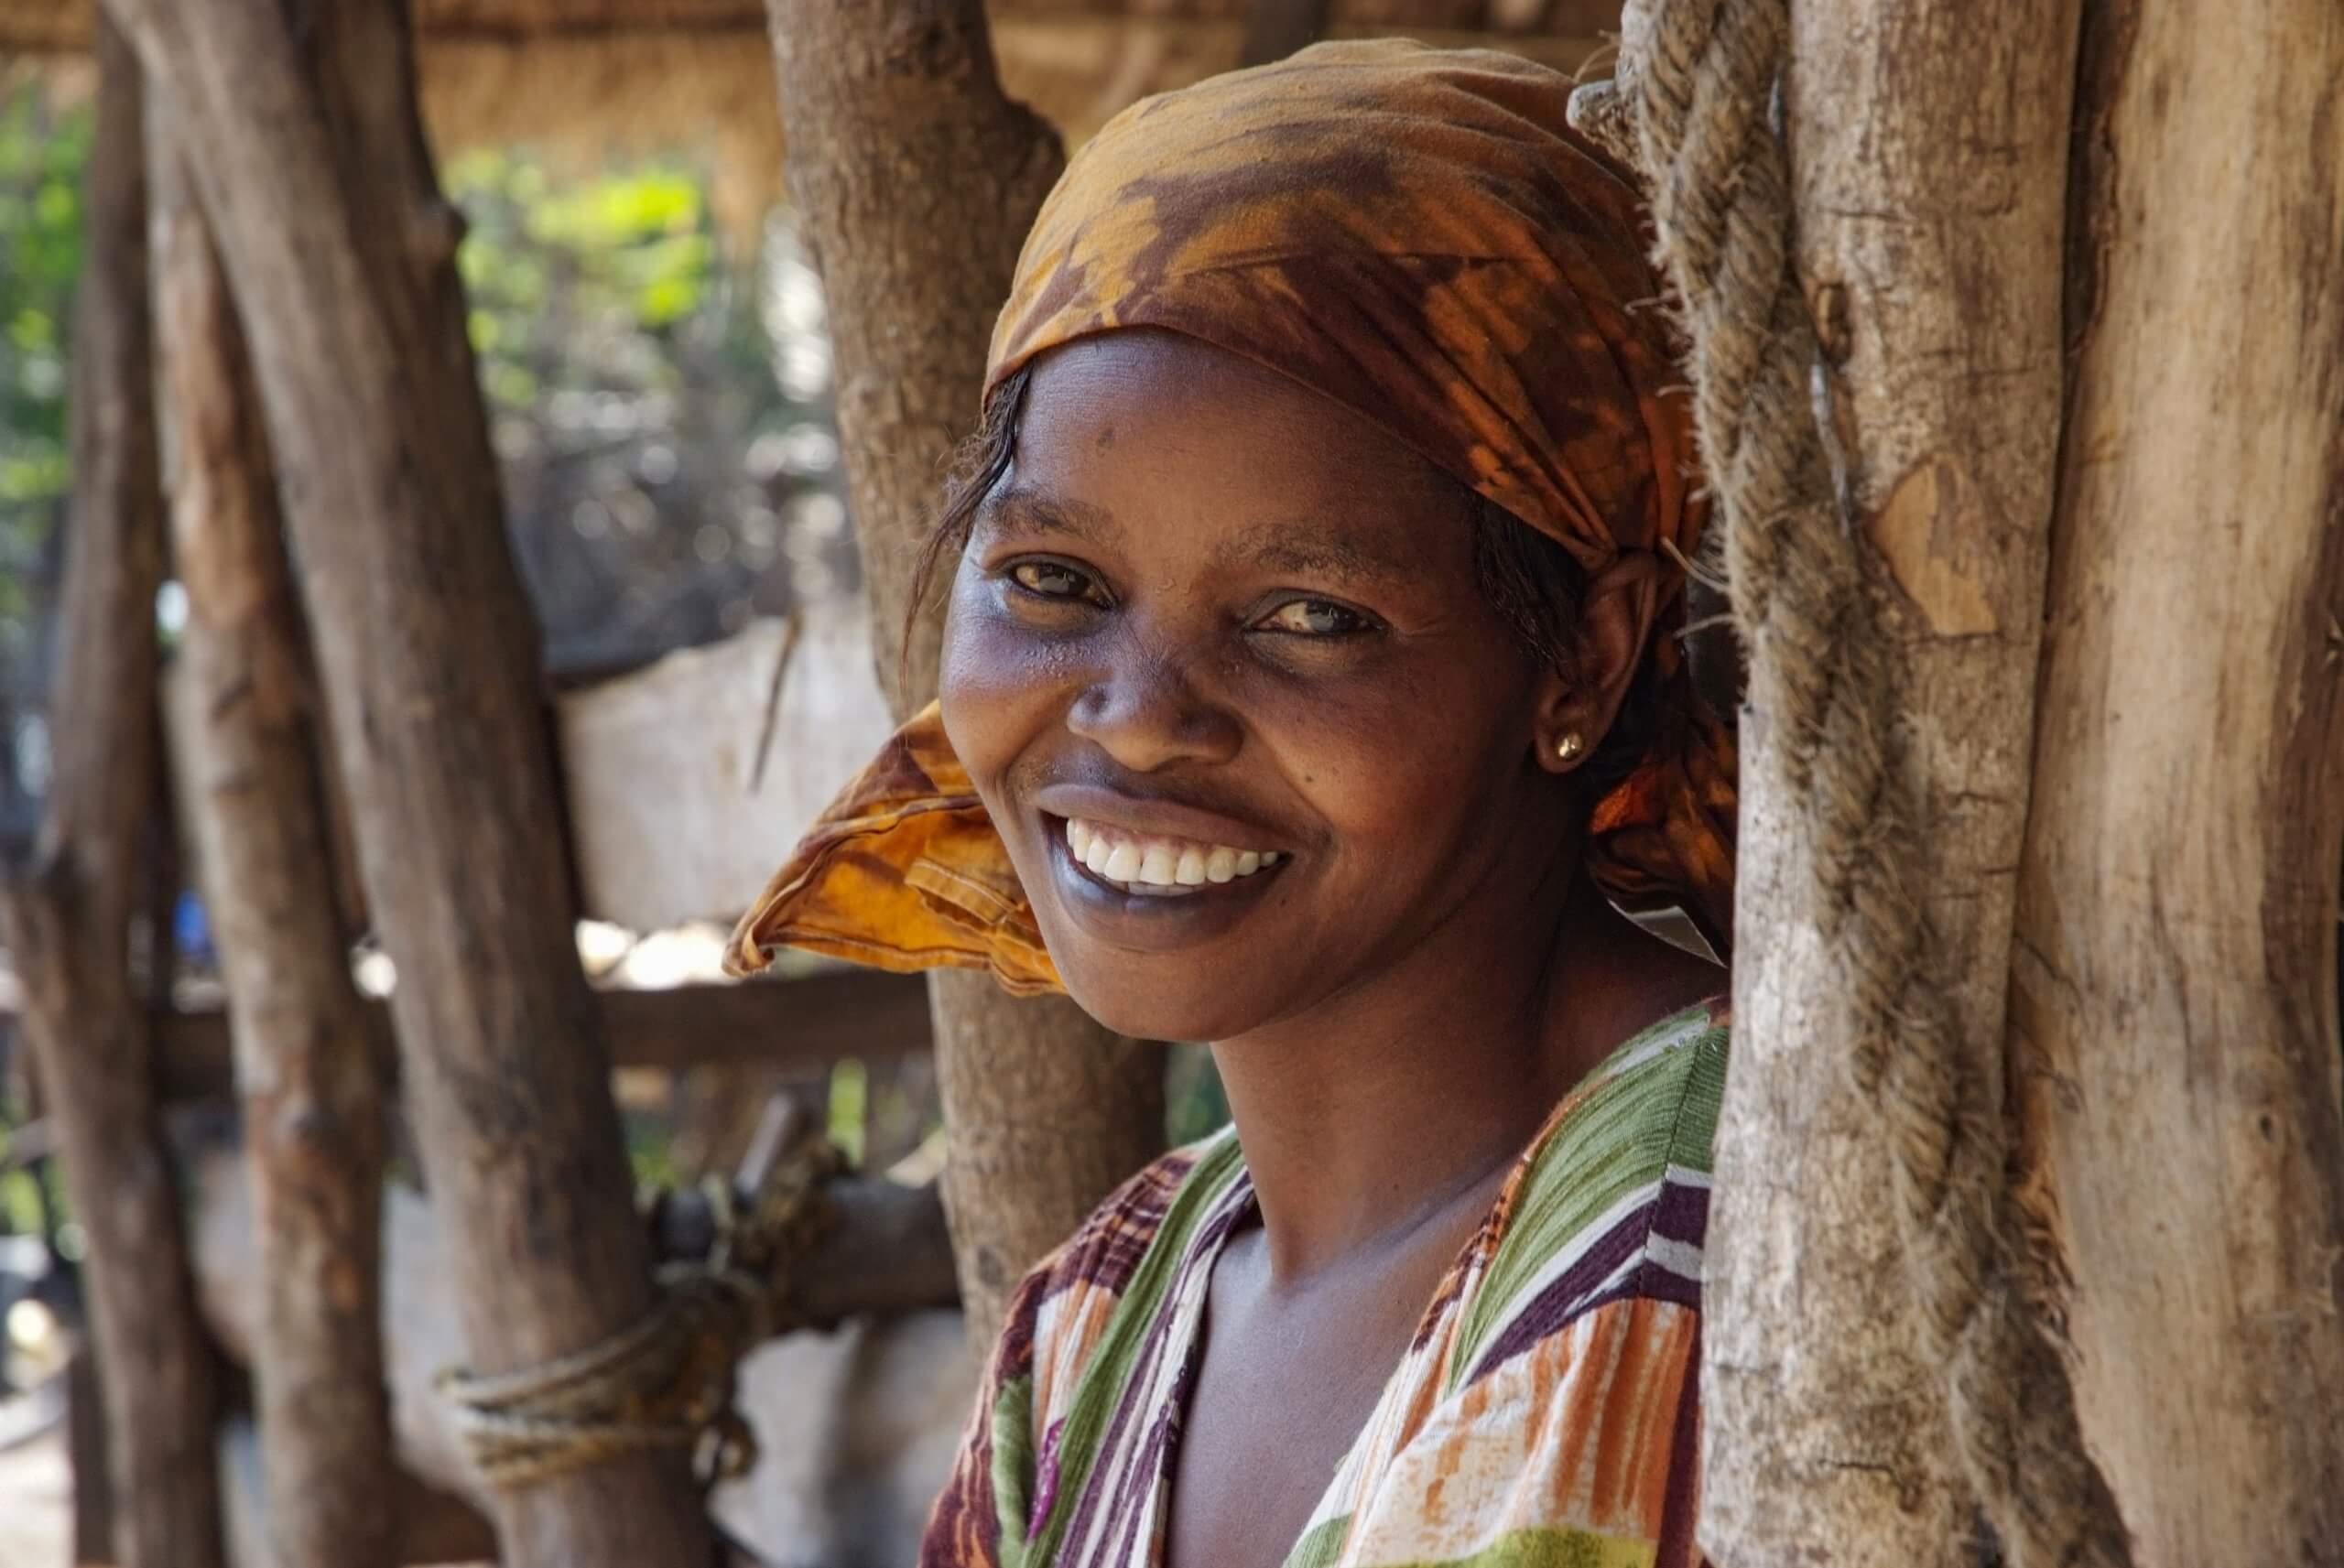 07 03 boerin trotsevrouw Tanga Agnes Mahamudu tanzania 3637 scaled